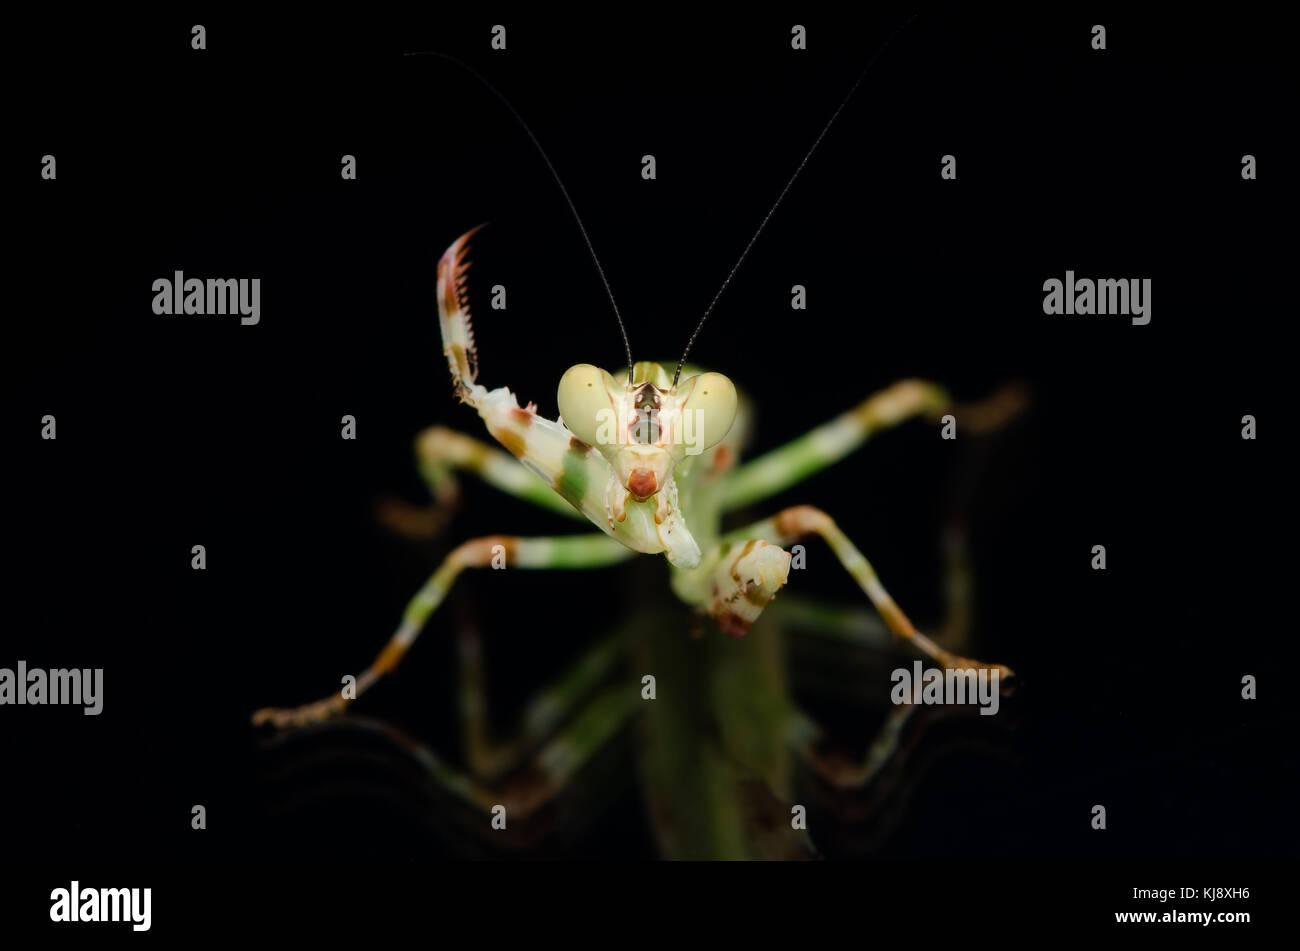 Flor de bandas masculinas. theopropus mantis elegans, mantis malasia. aislado sobre fondo negro. Imagen De Stock